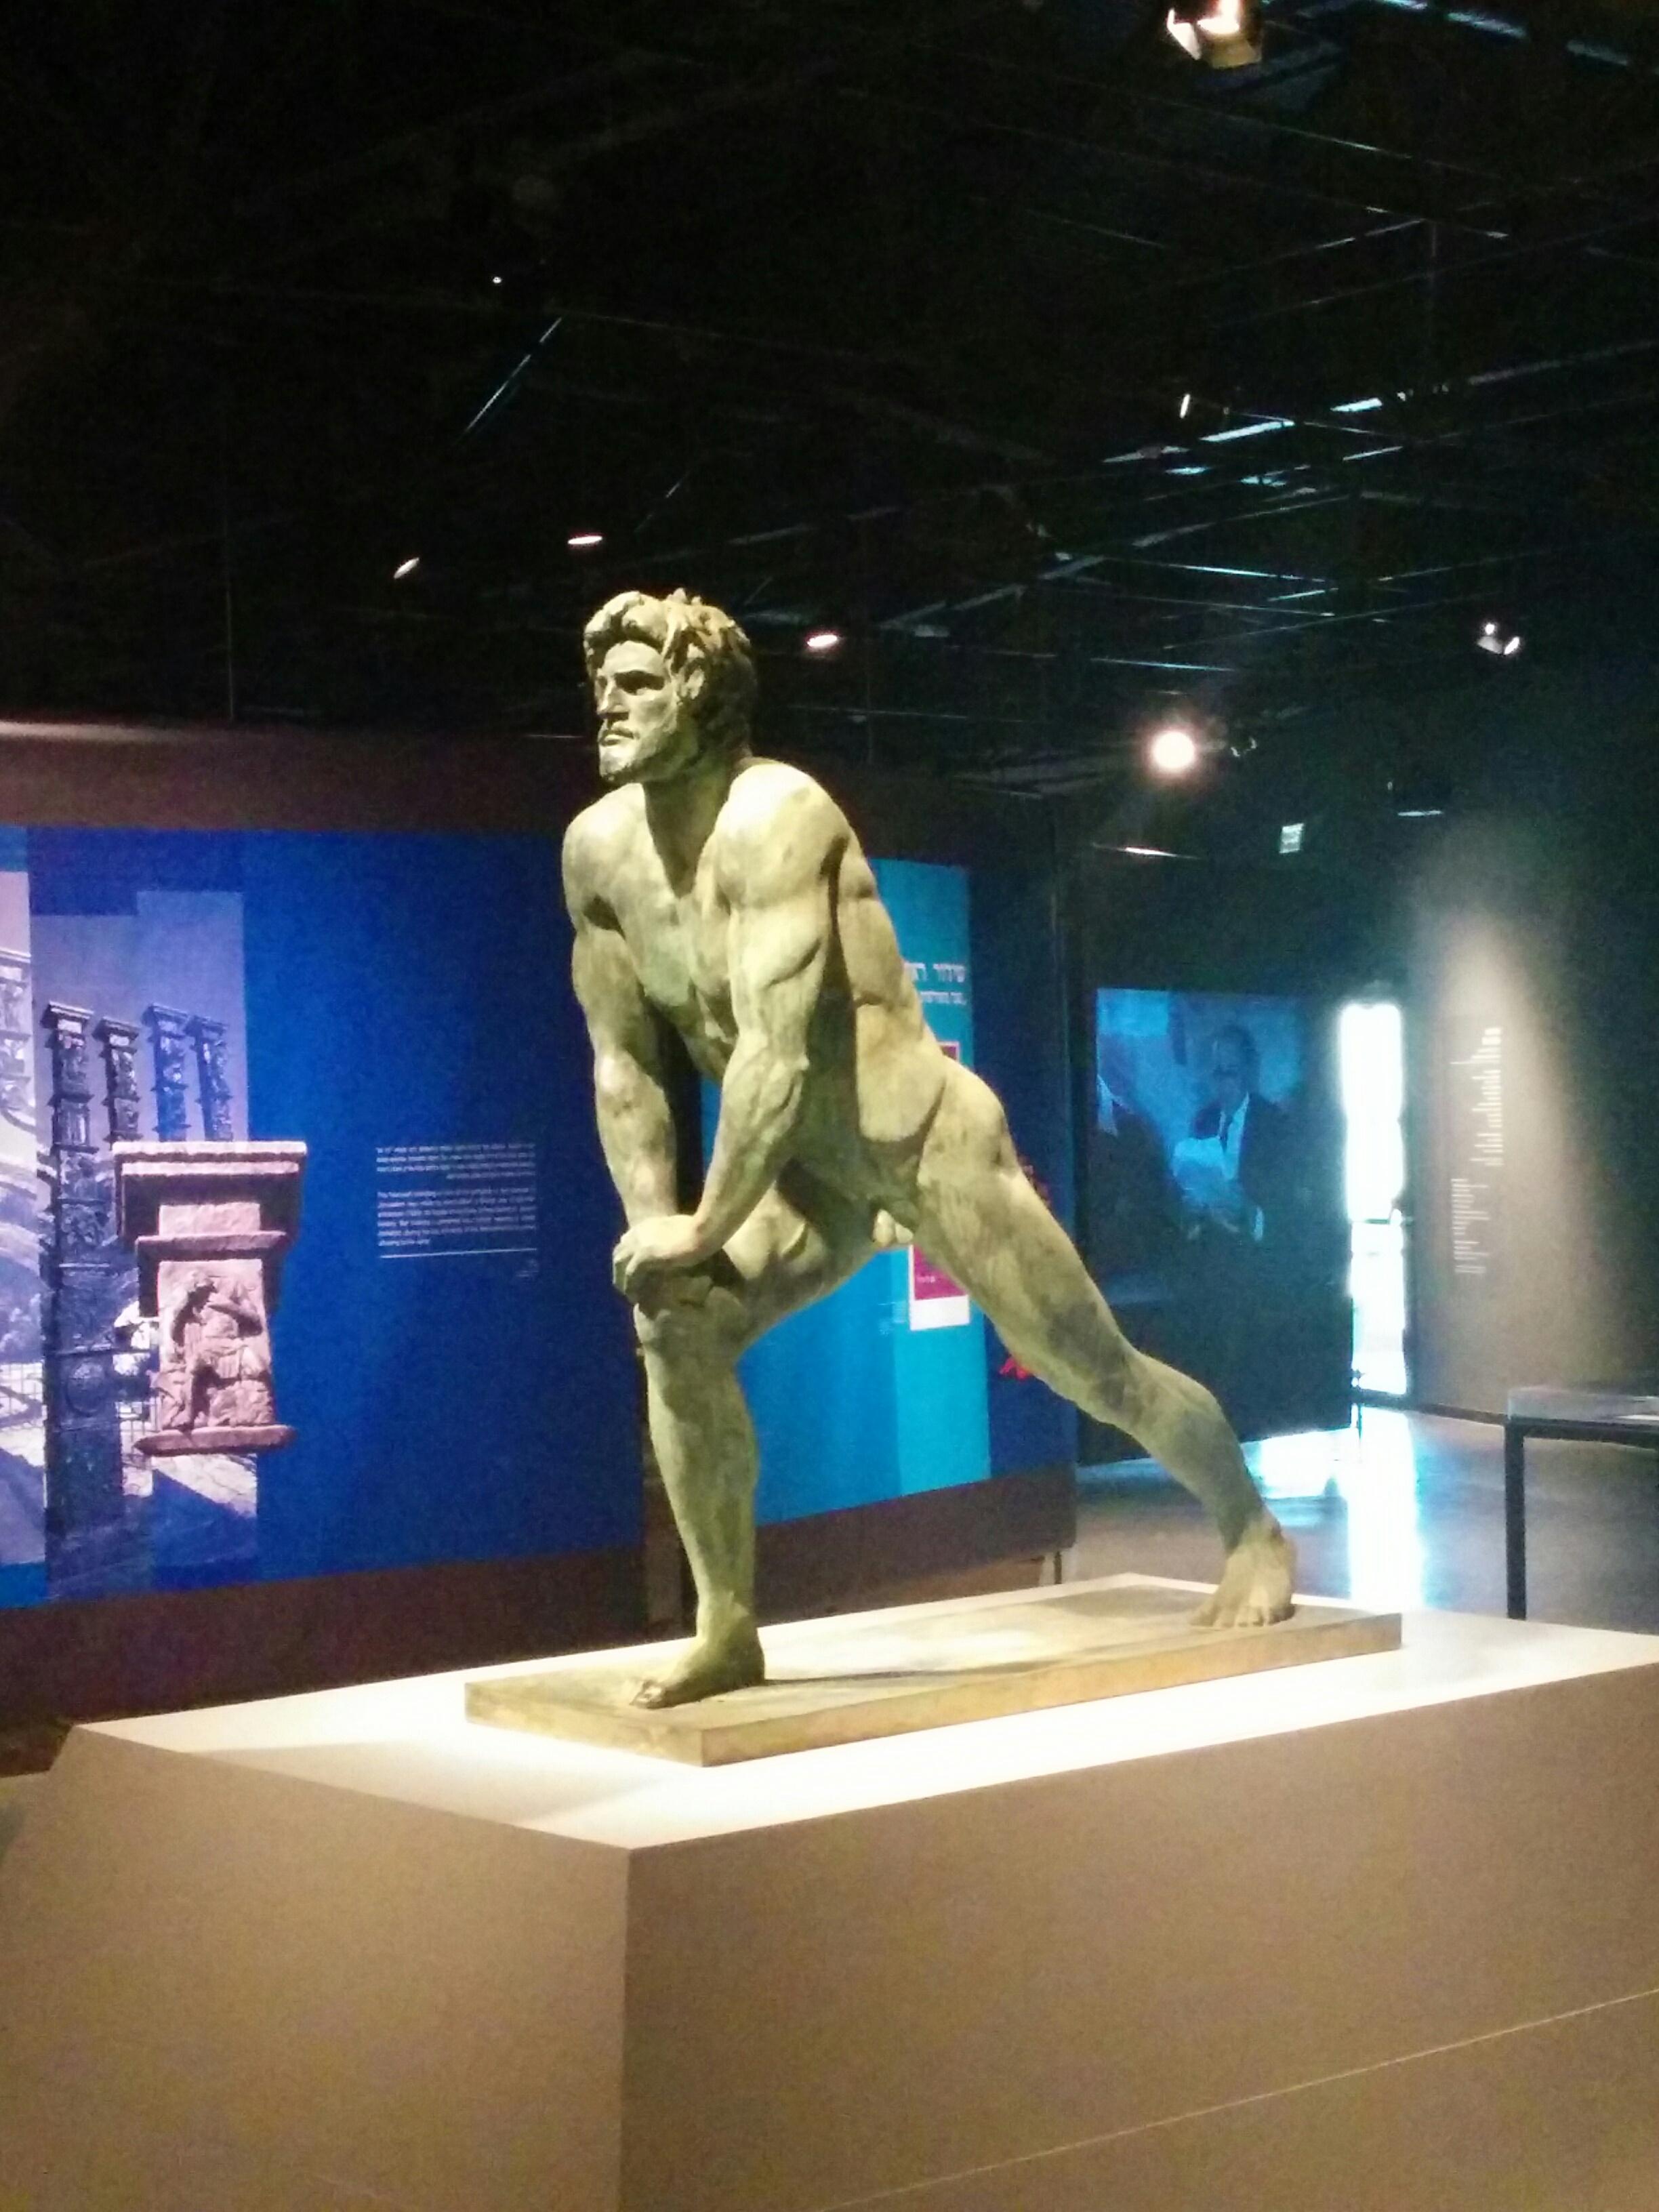 Bar Kokhba statue - Shimon Bar Kokhba - Eretz Israel Museum